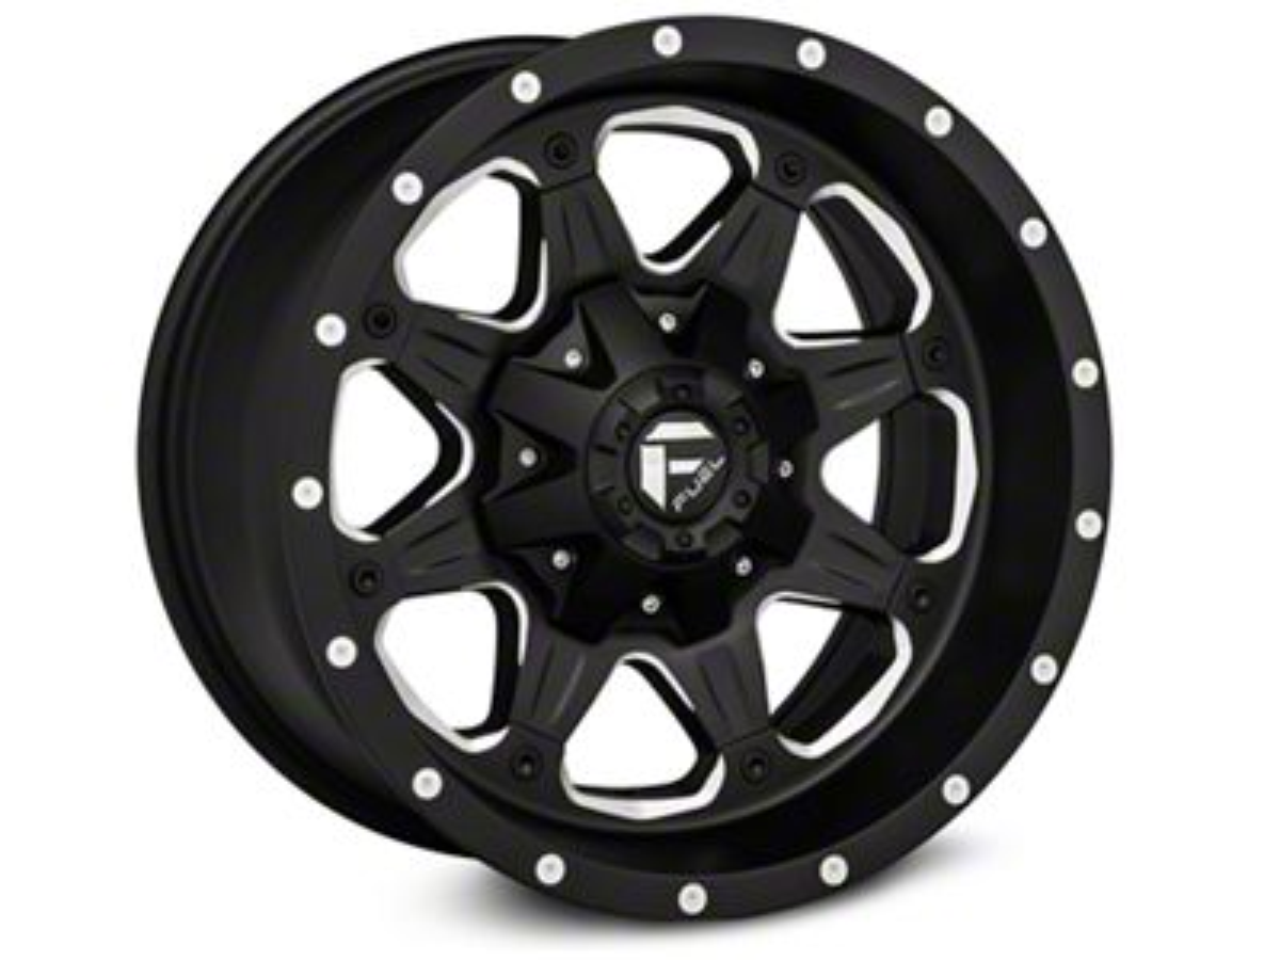 Fuel Wheels Boost Black Milled Wheel - 20x9 (18-19 Jeep Wrangler JL)